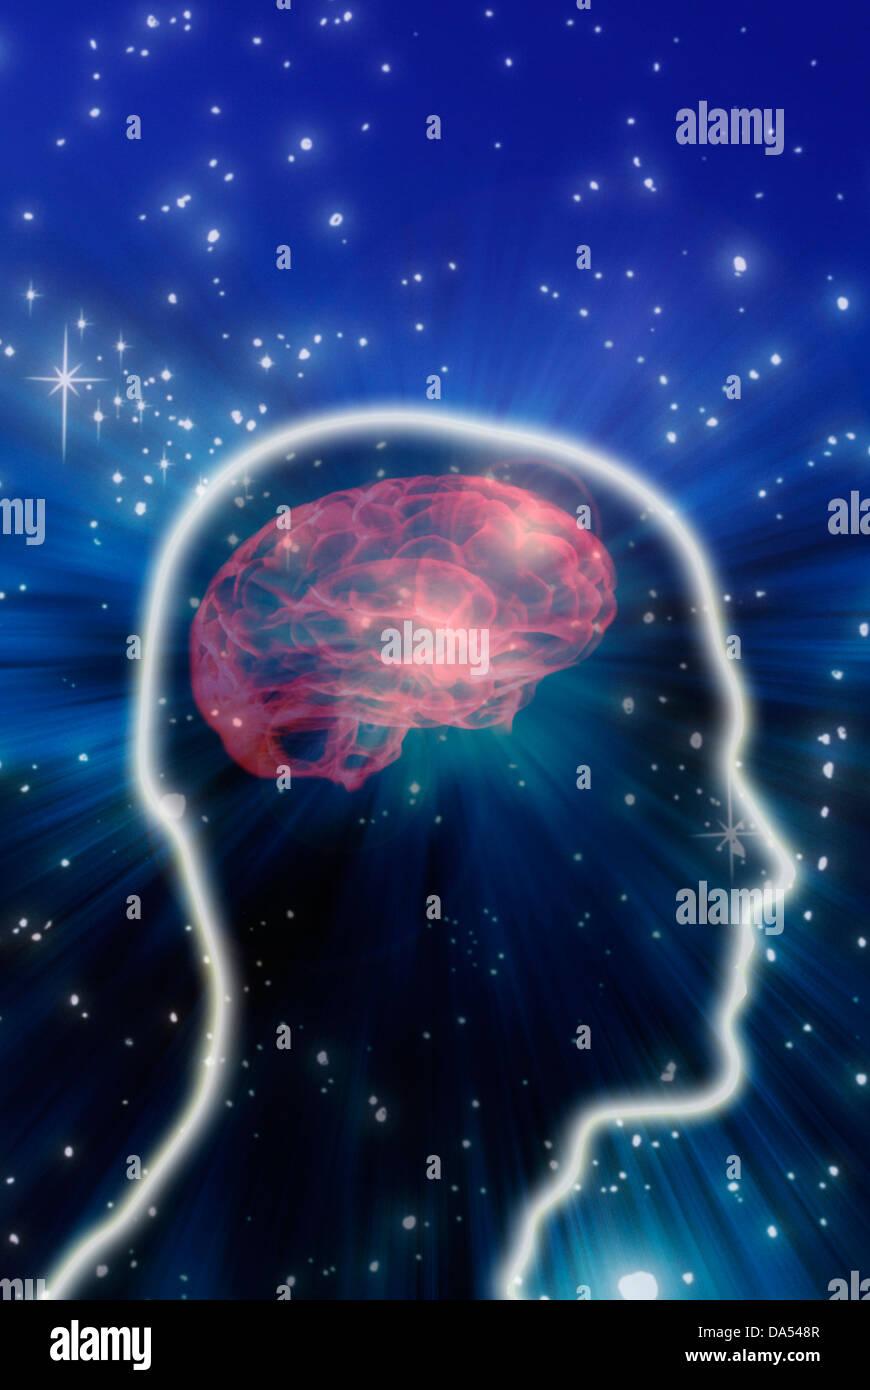 man head shape with brain seen through - Stock Image